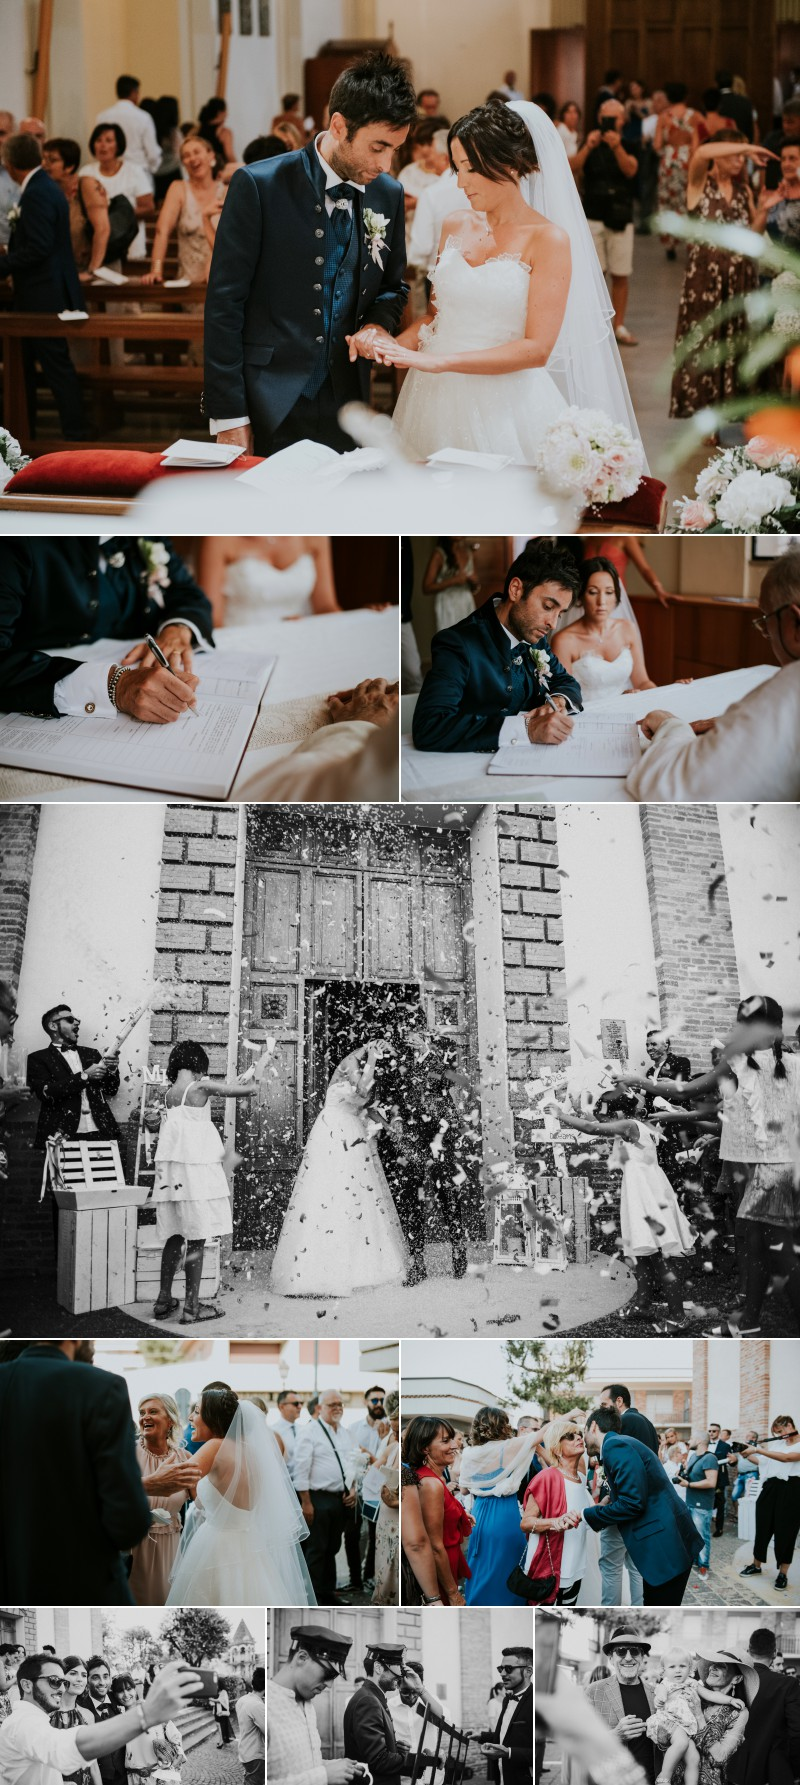 Fotografo Matrimonio Casa Celincordia Cesena 600